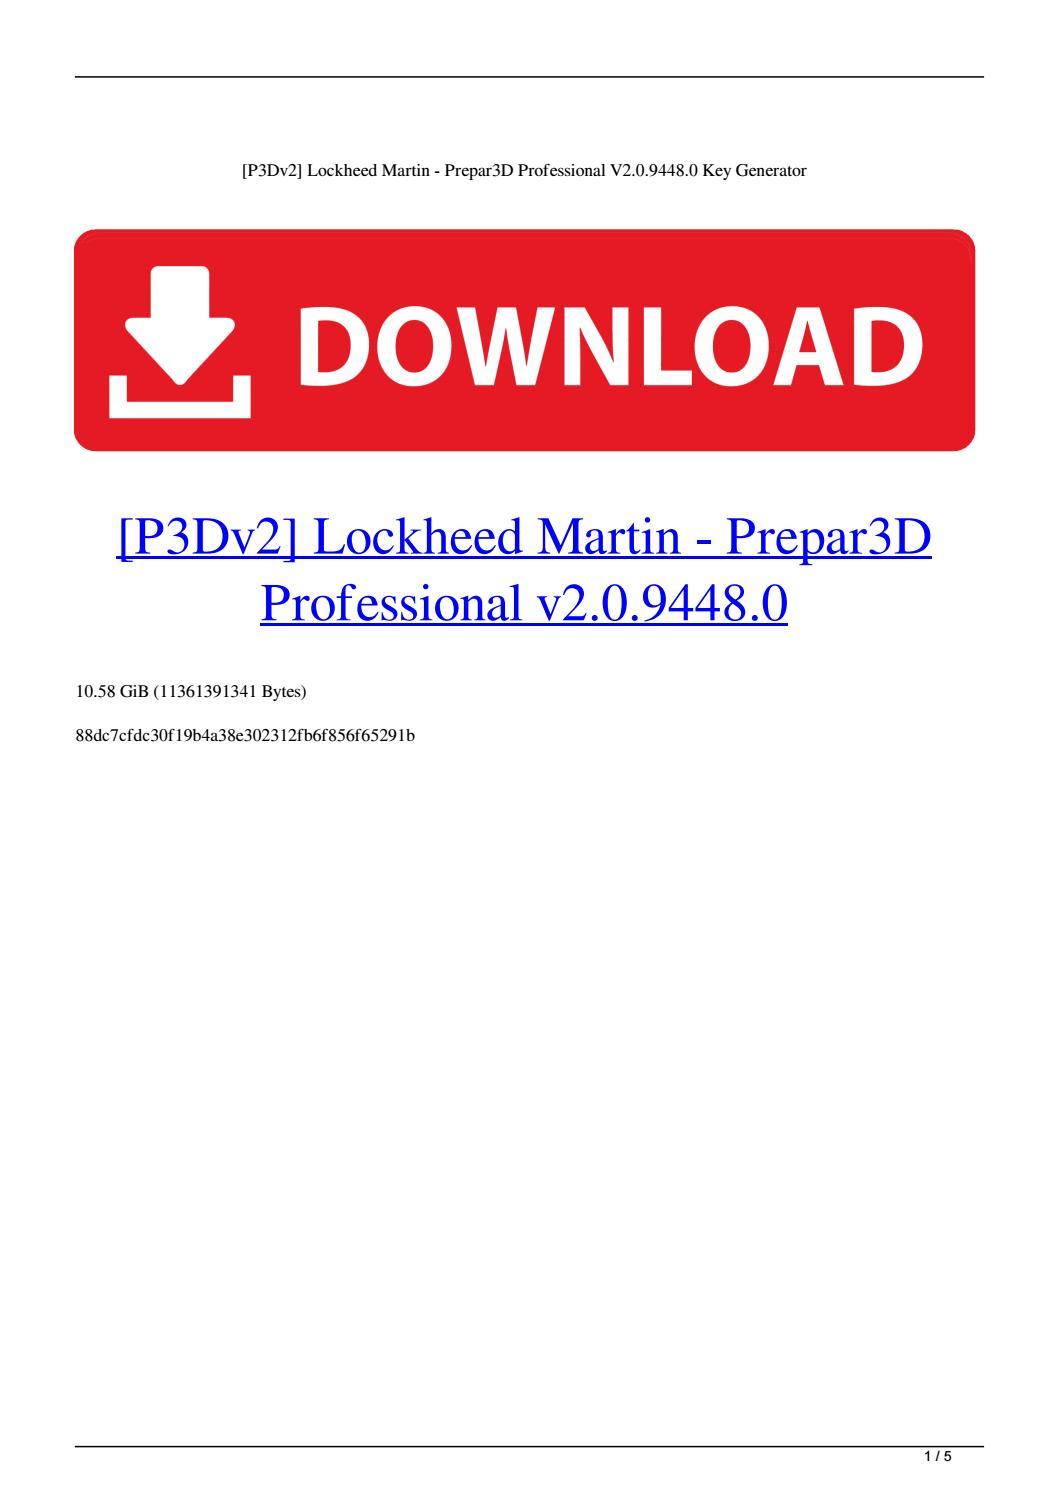 P3Dv2] Lockheed Martin - Prepar3D Professional V2 0 9448 0